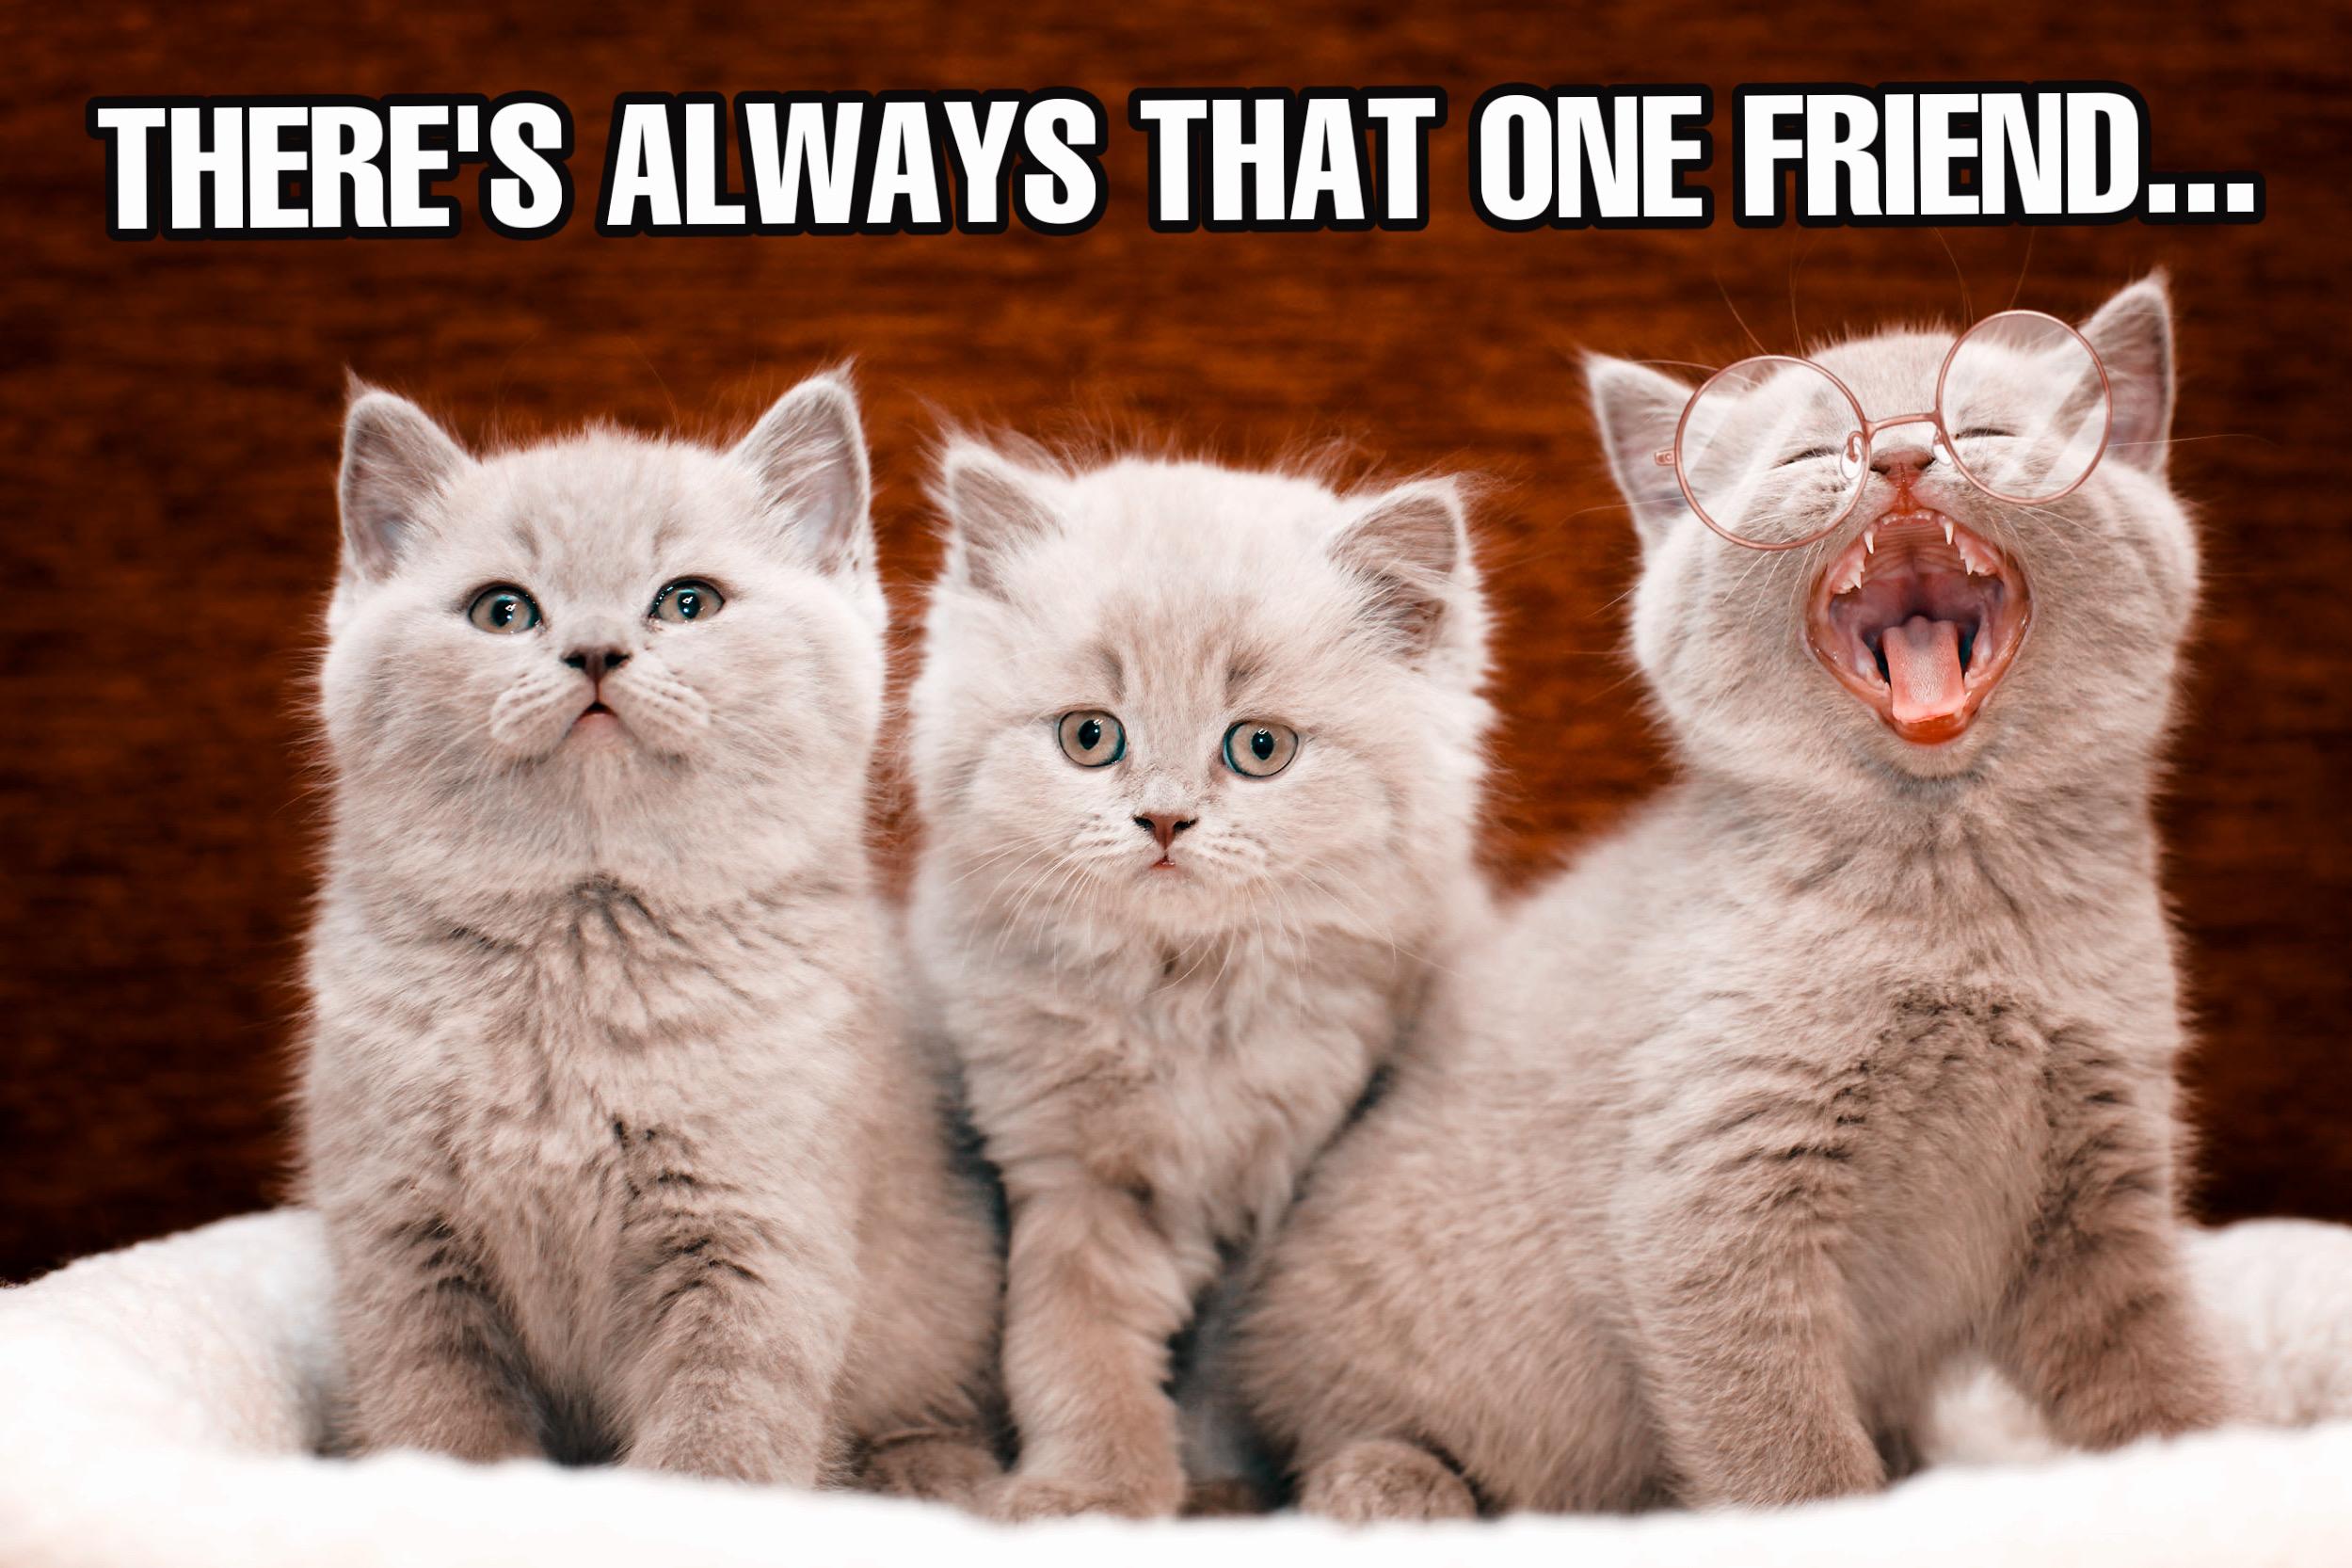 Meme of three kittens made with meme maker tool